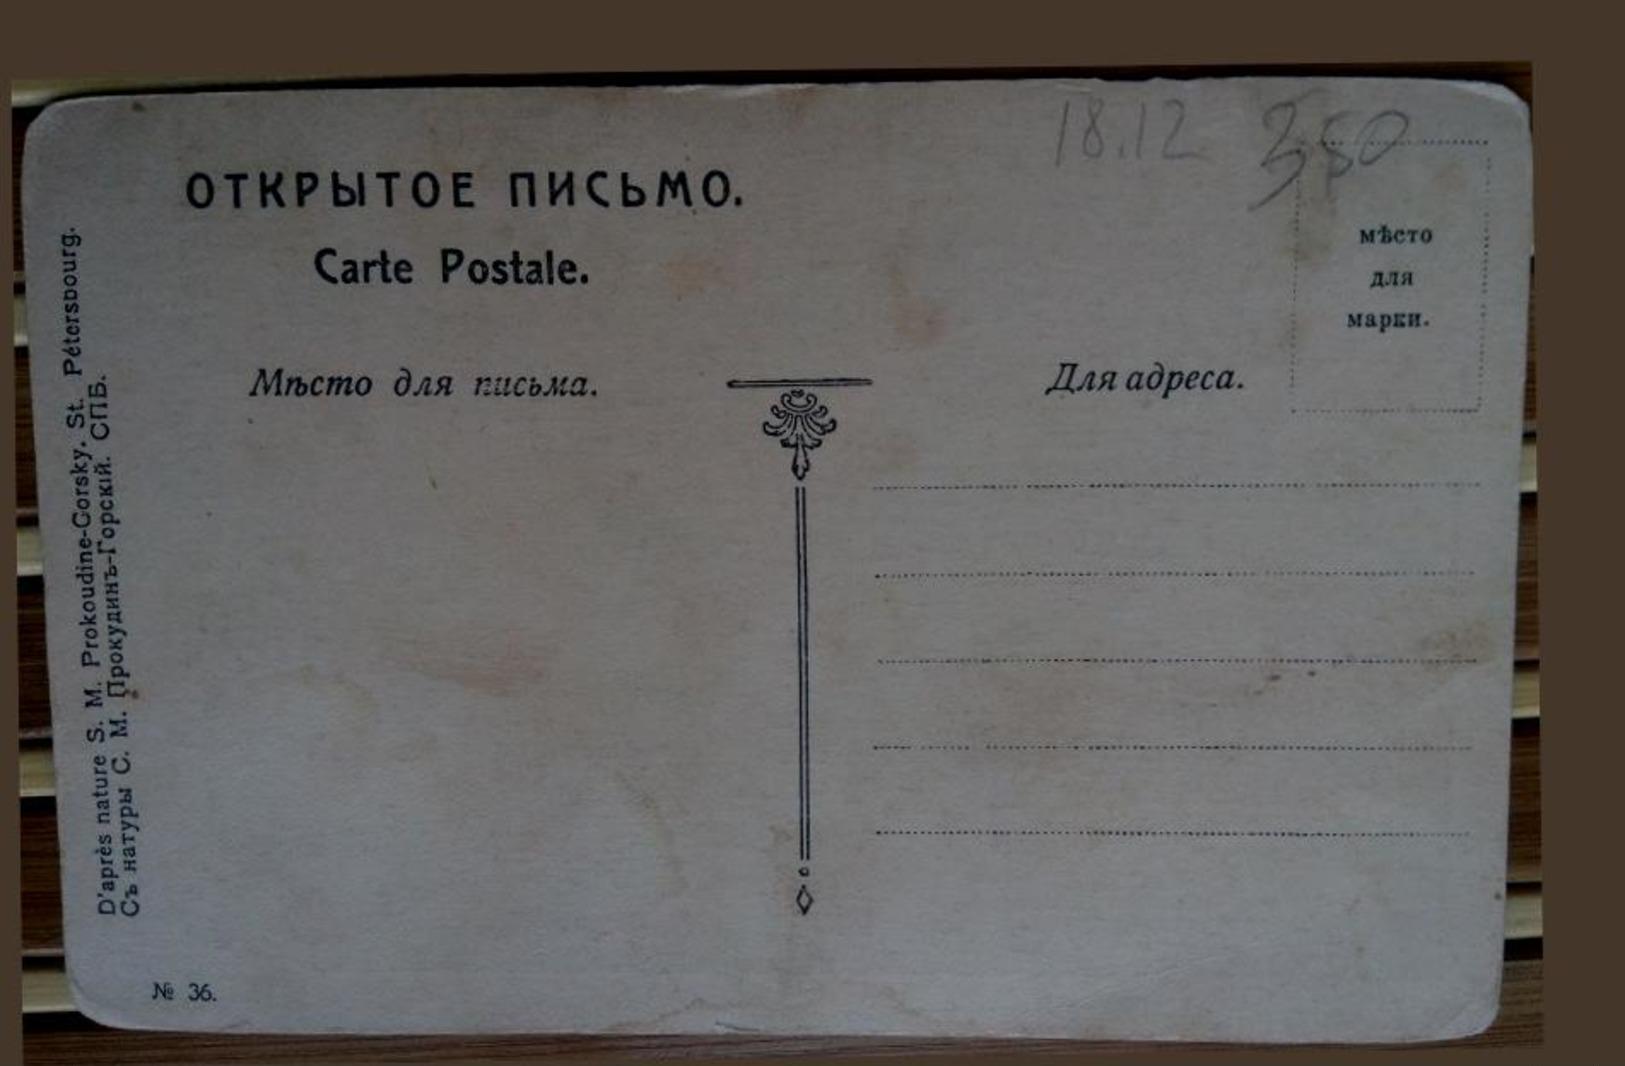 Pétersbourg Moika Petrograd Cachet Prokudin Gorsky Palais Reformé - Churches & Cathedrals